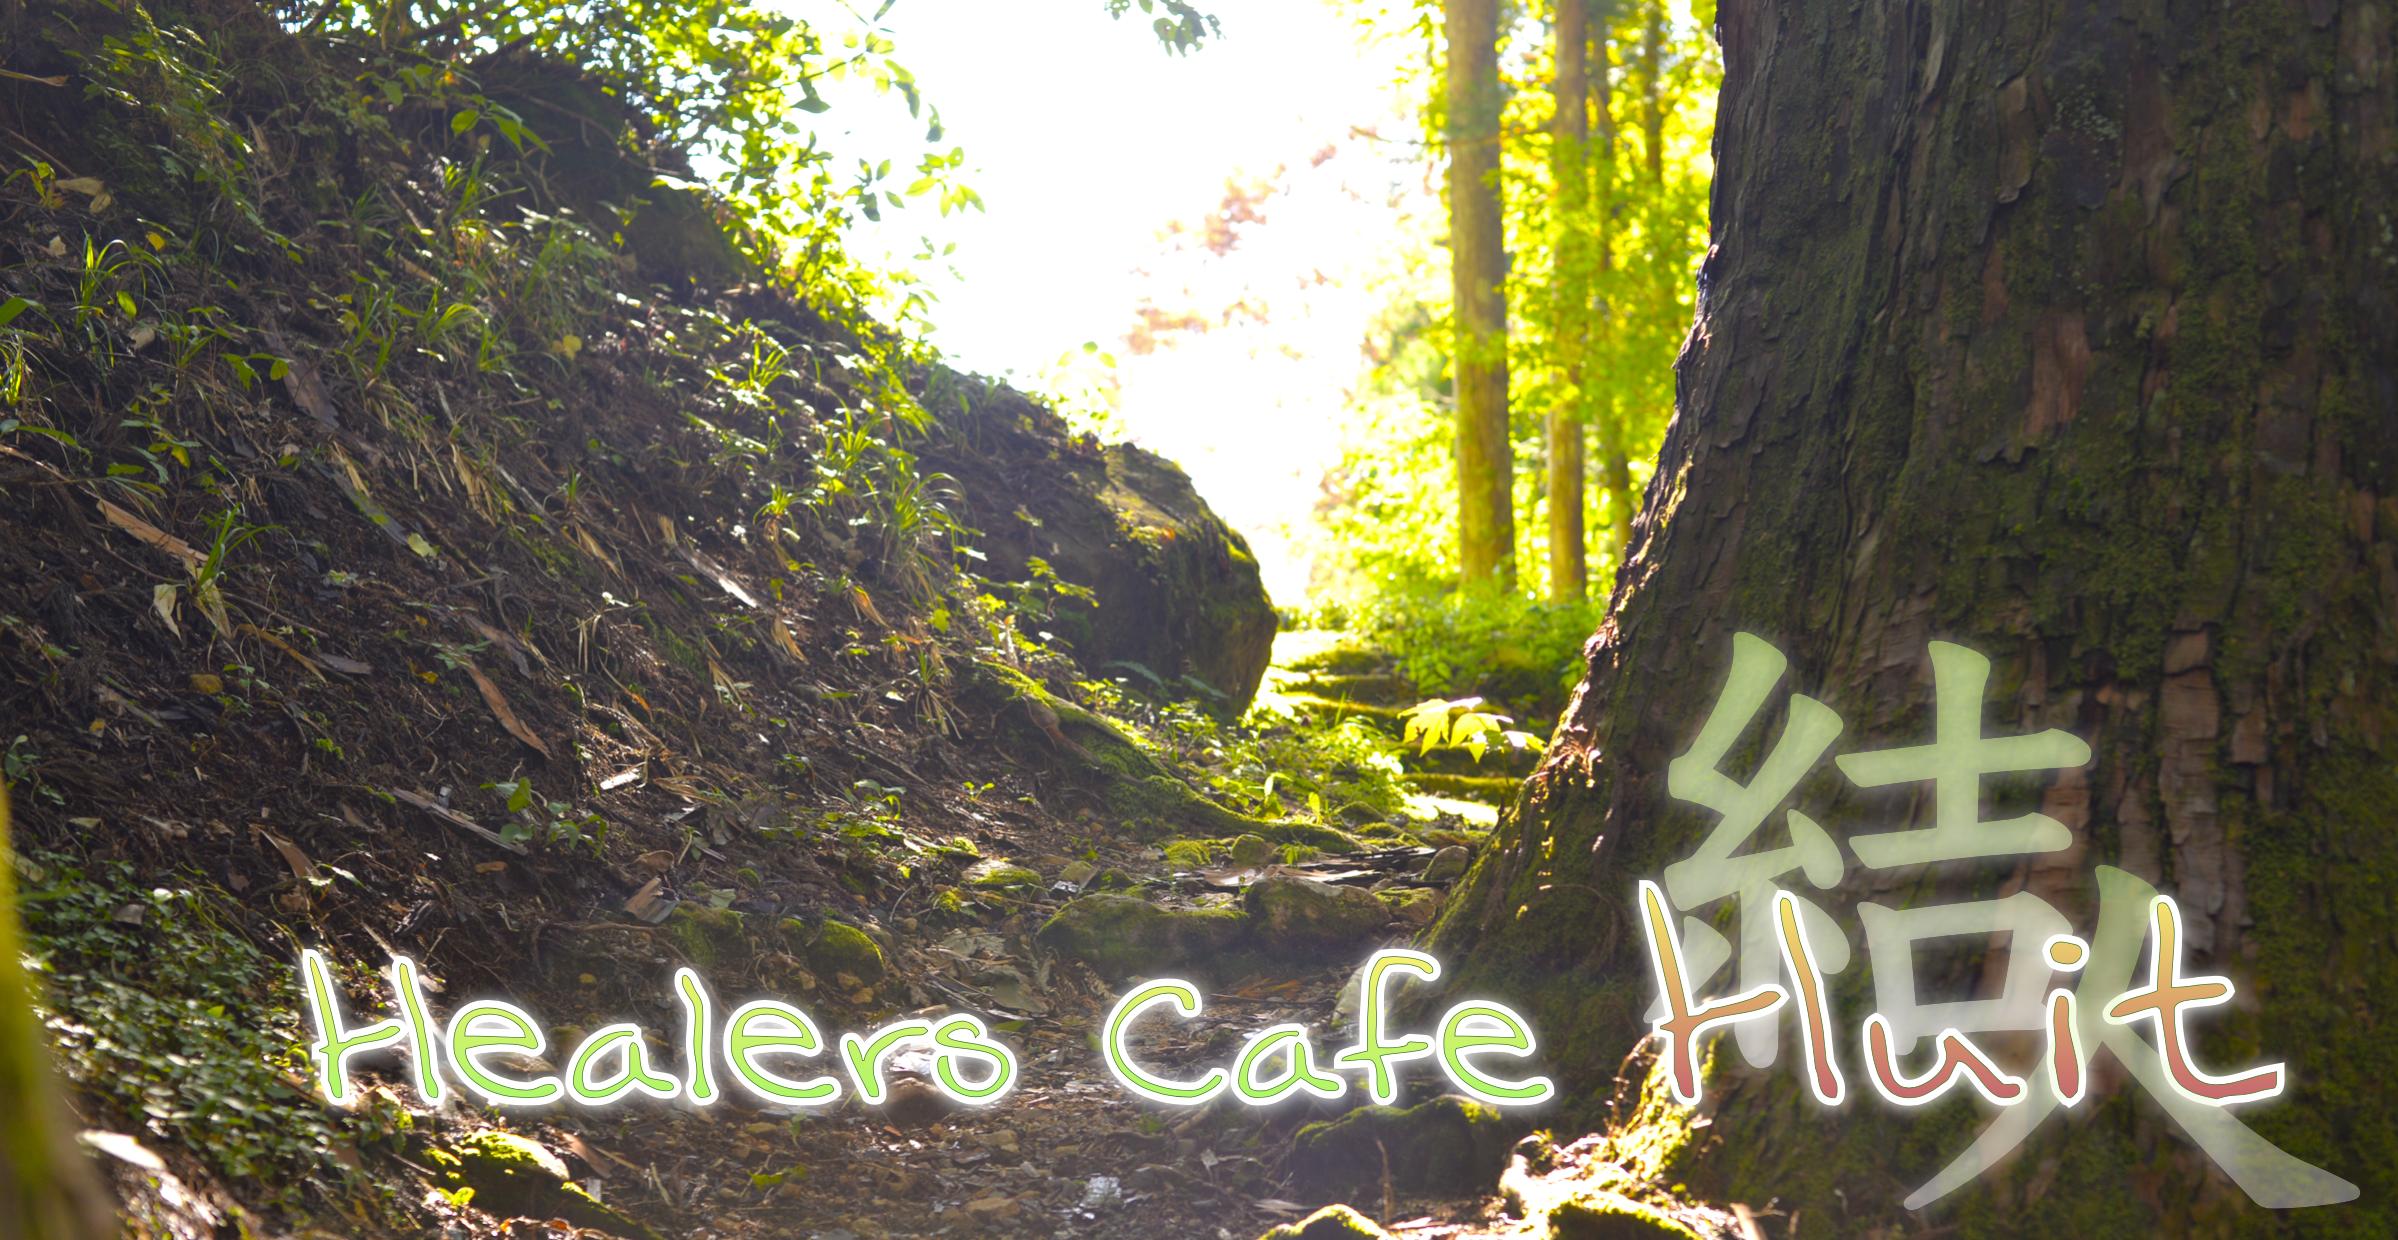 Healers Cafe Huit〜結人〜